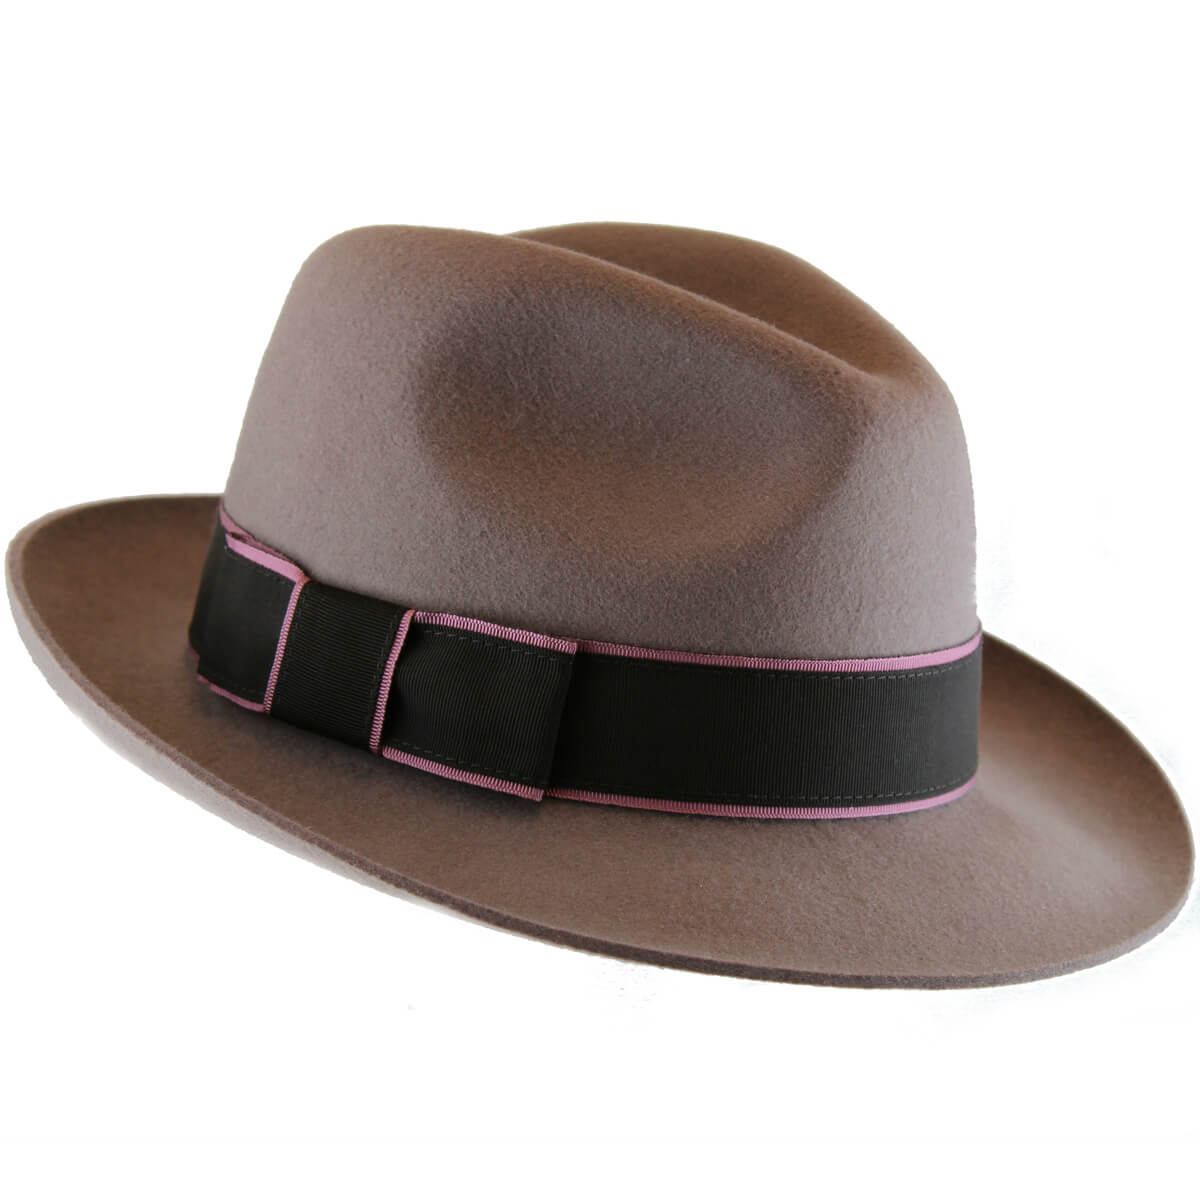 Rosie Wool Felt Trilby Hat - Mink in Size 57